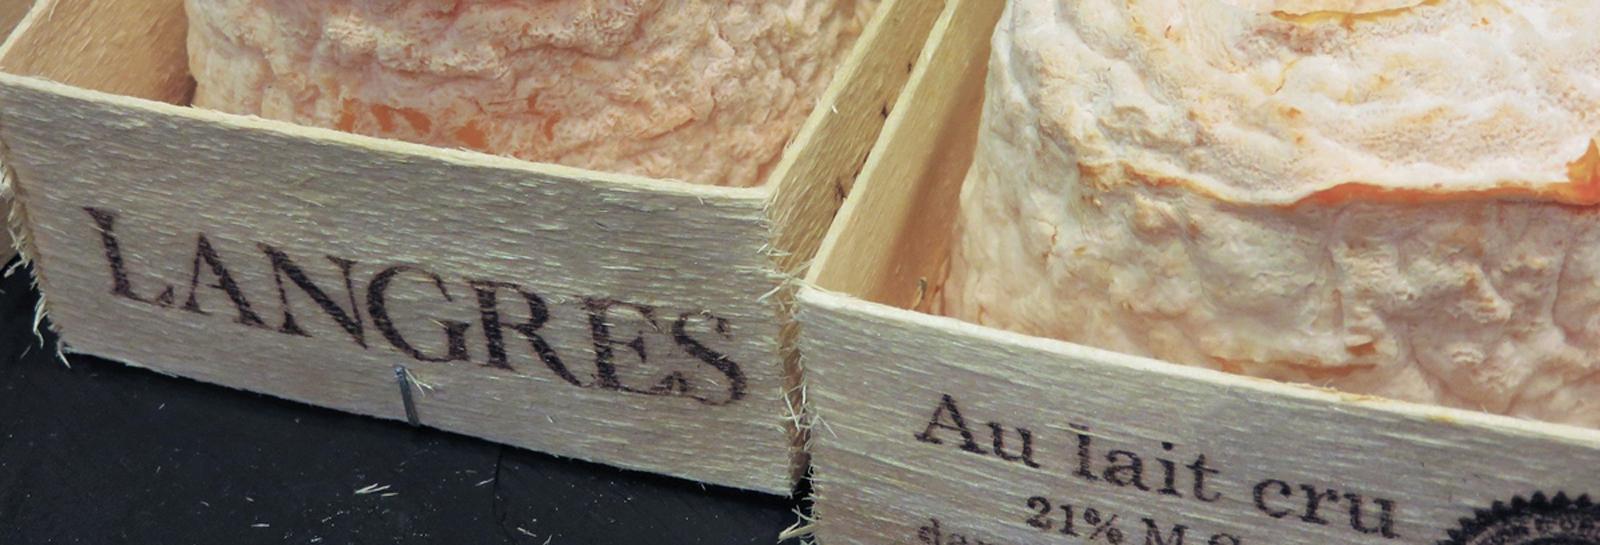 French Cheese Langres | TheTasteWorkshop.com